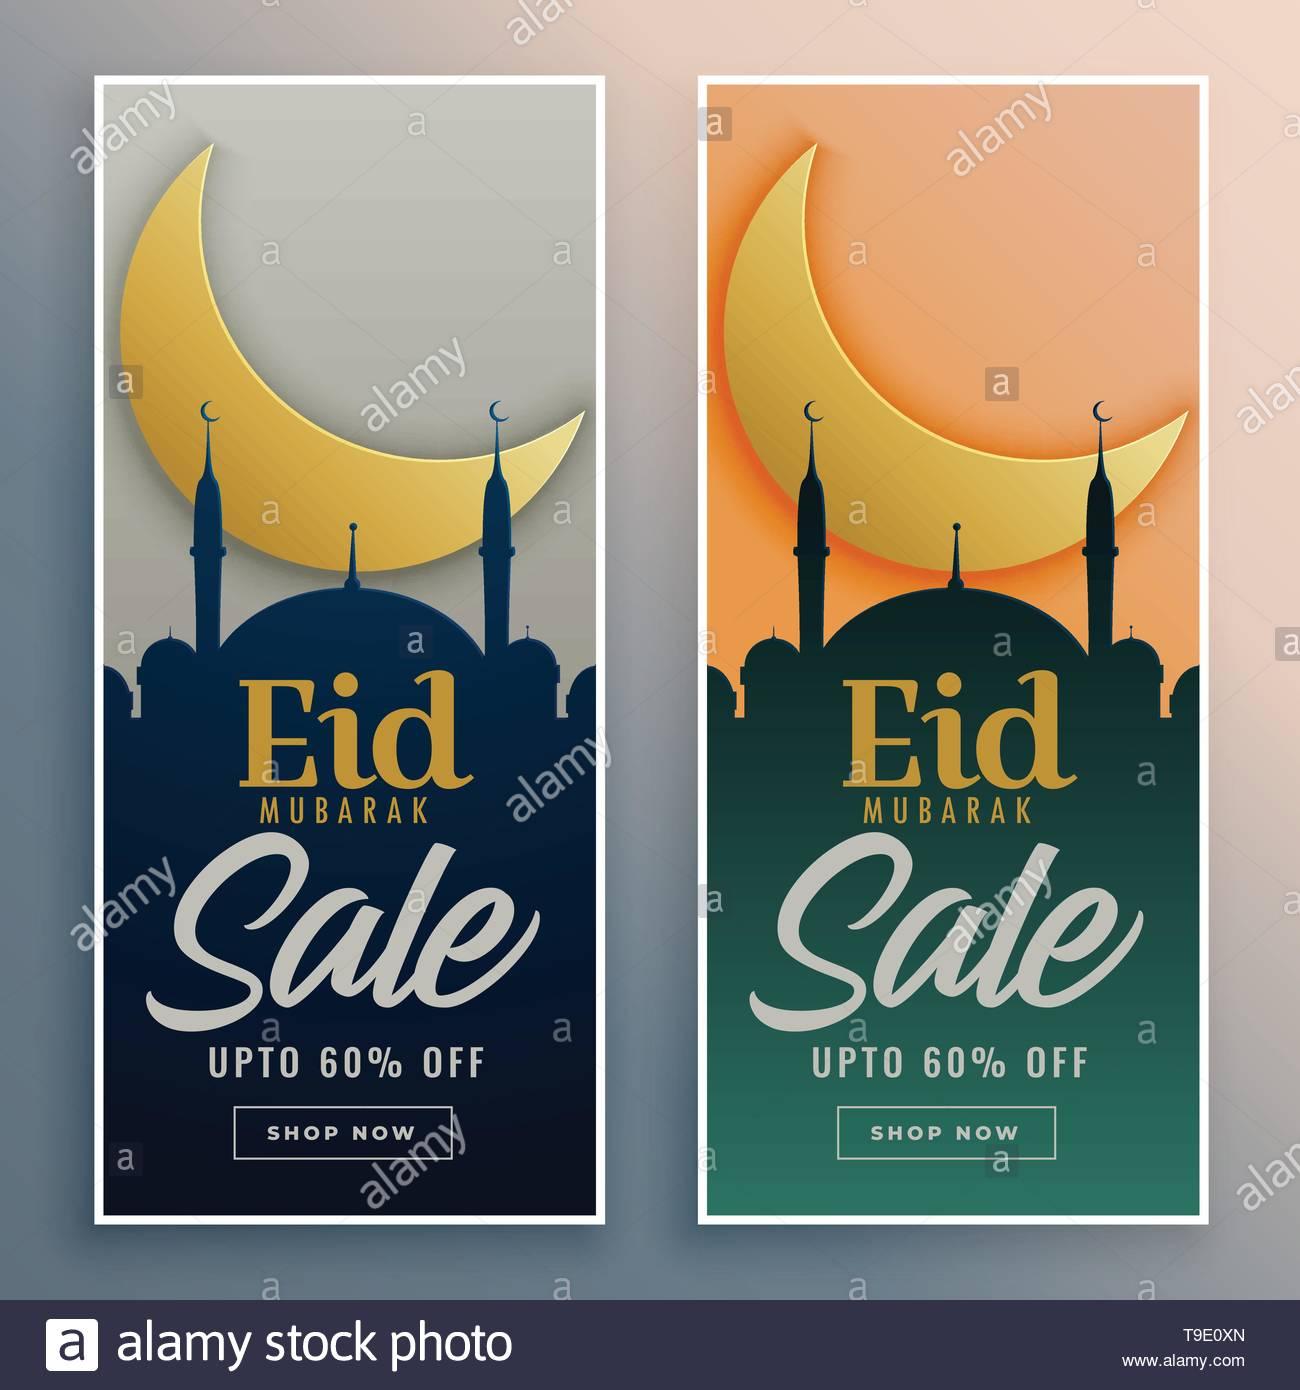 2d4b8f030a eid mubarak islamic banners for sale promotion Stock Vector Art ...